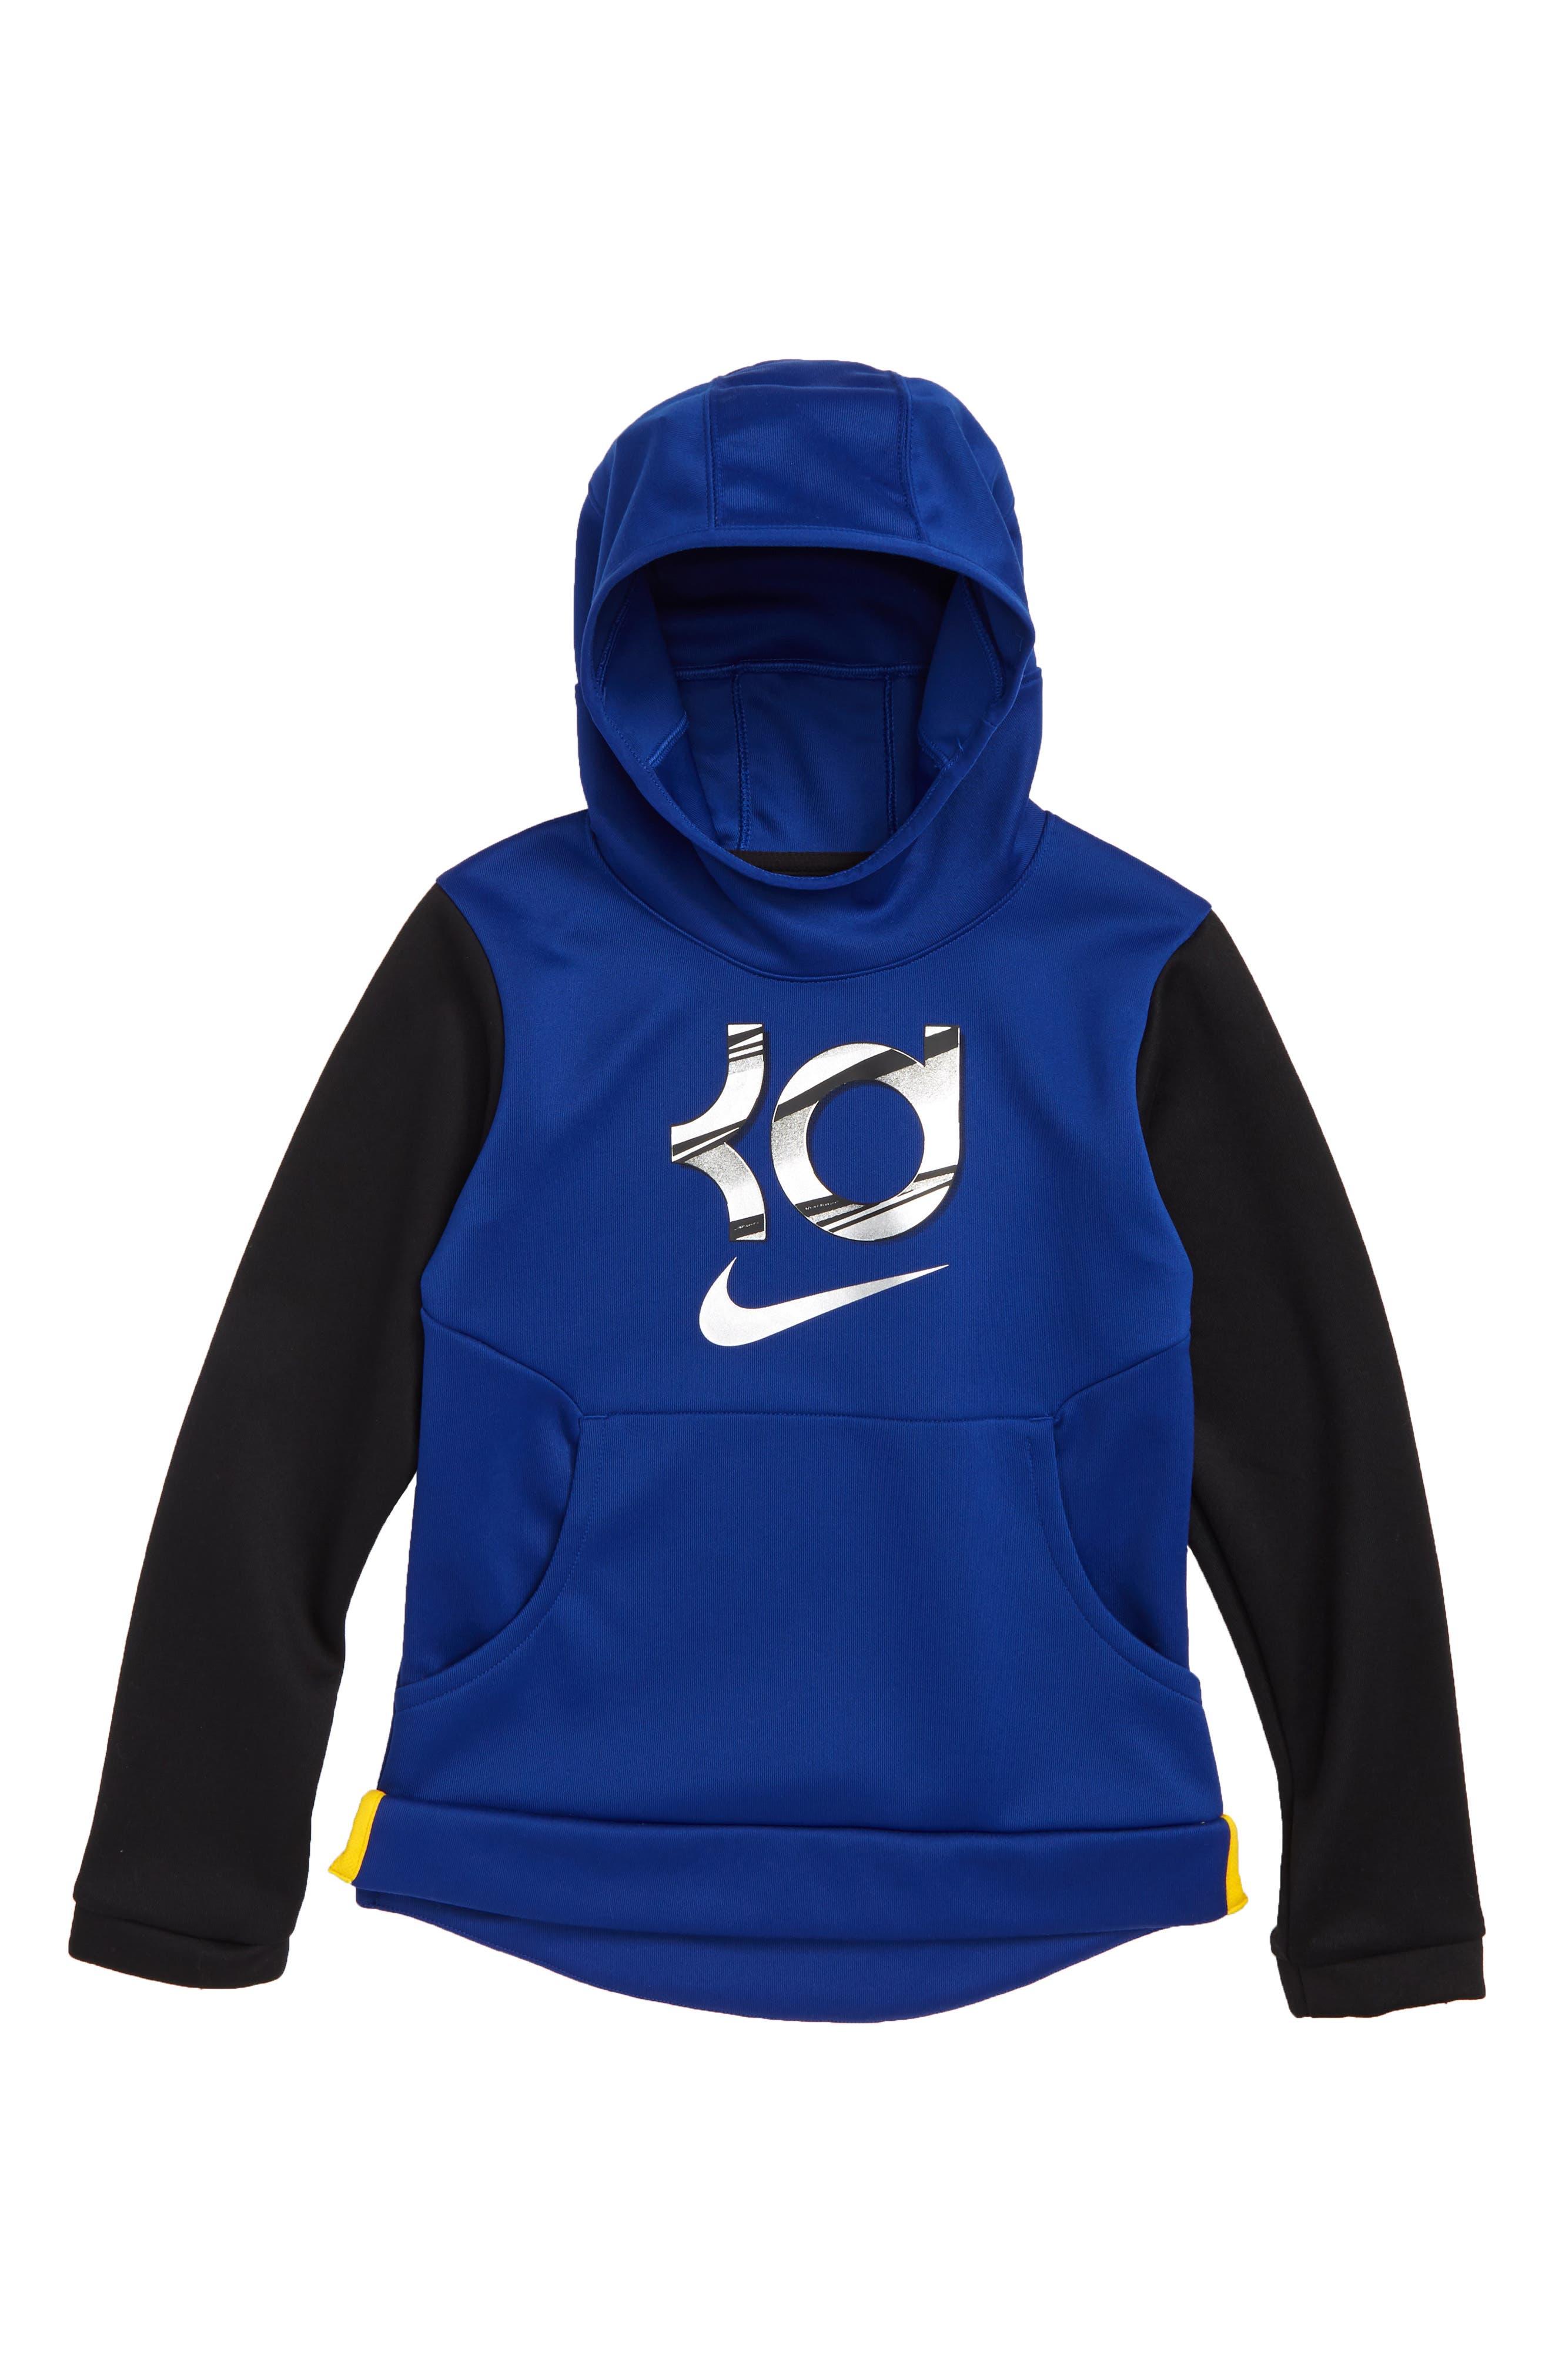 KD Dry Hoodie,                         Main,                         color, RUSH BLUE/ BLACK